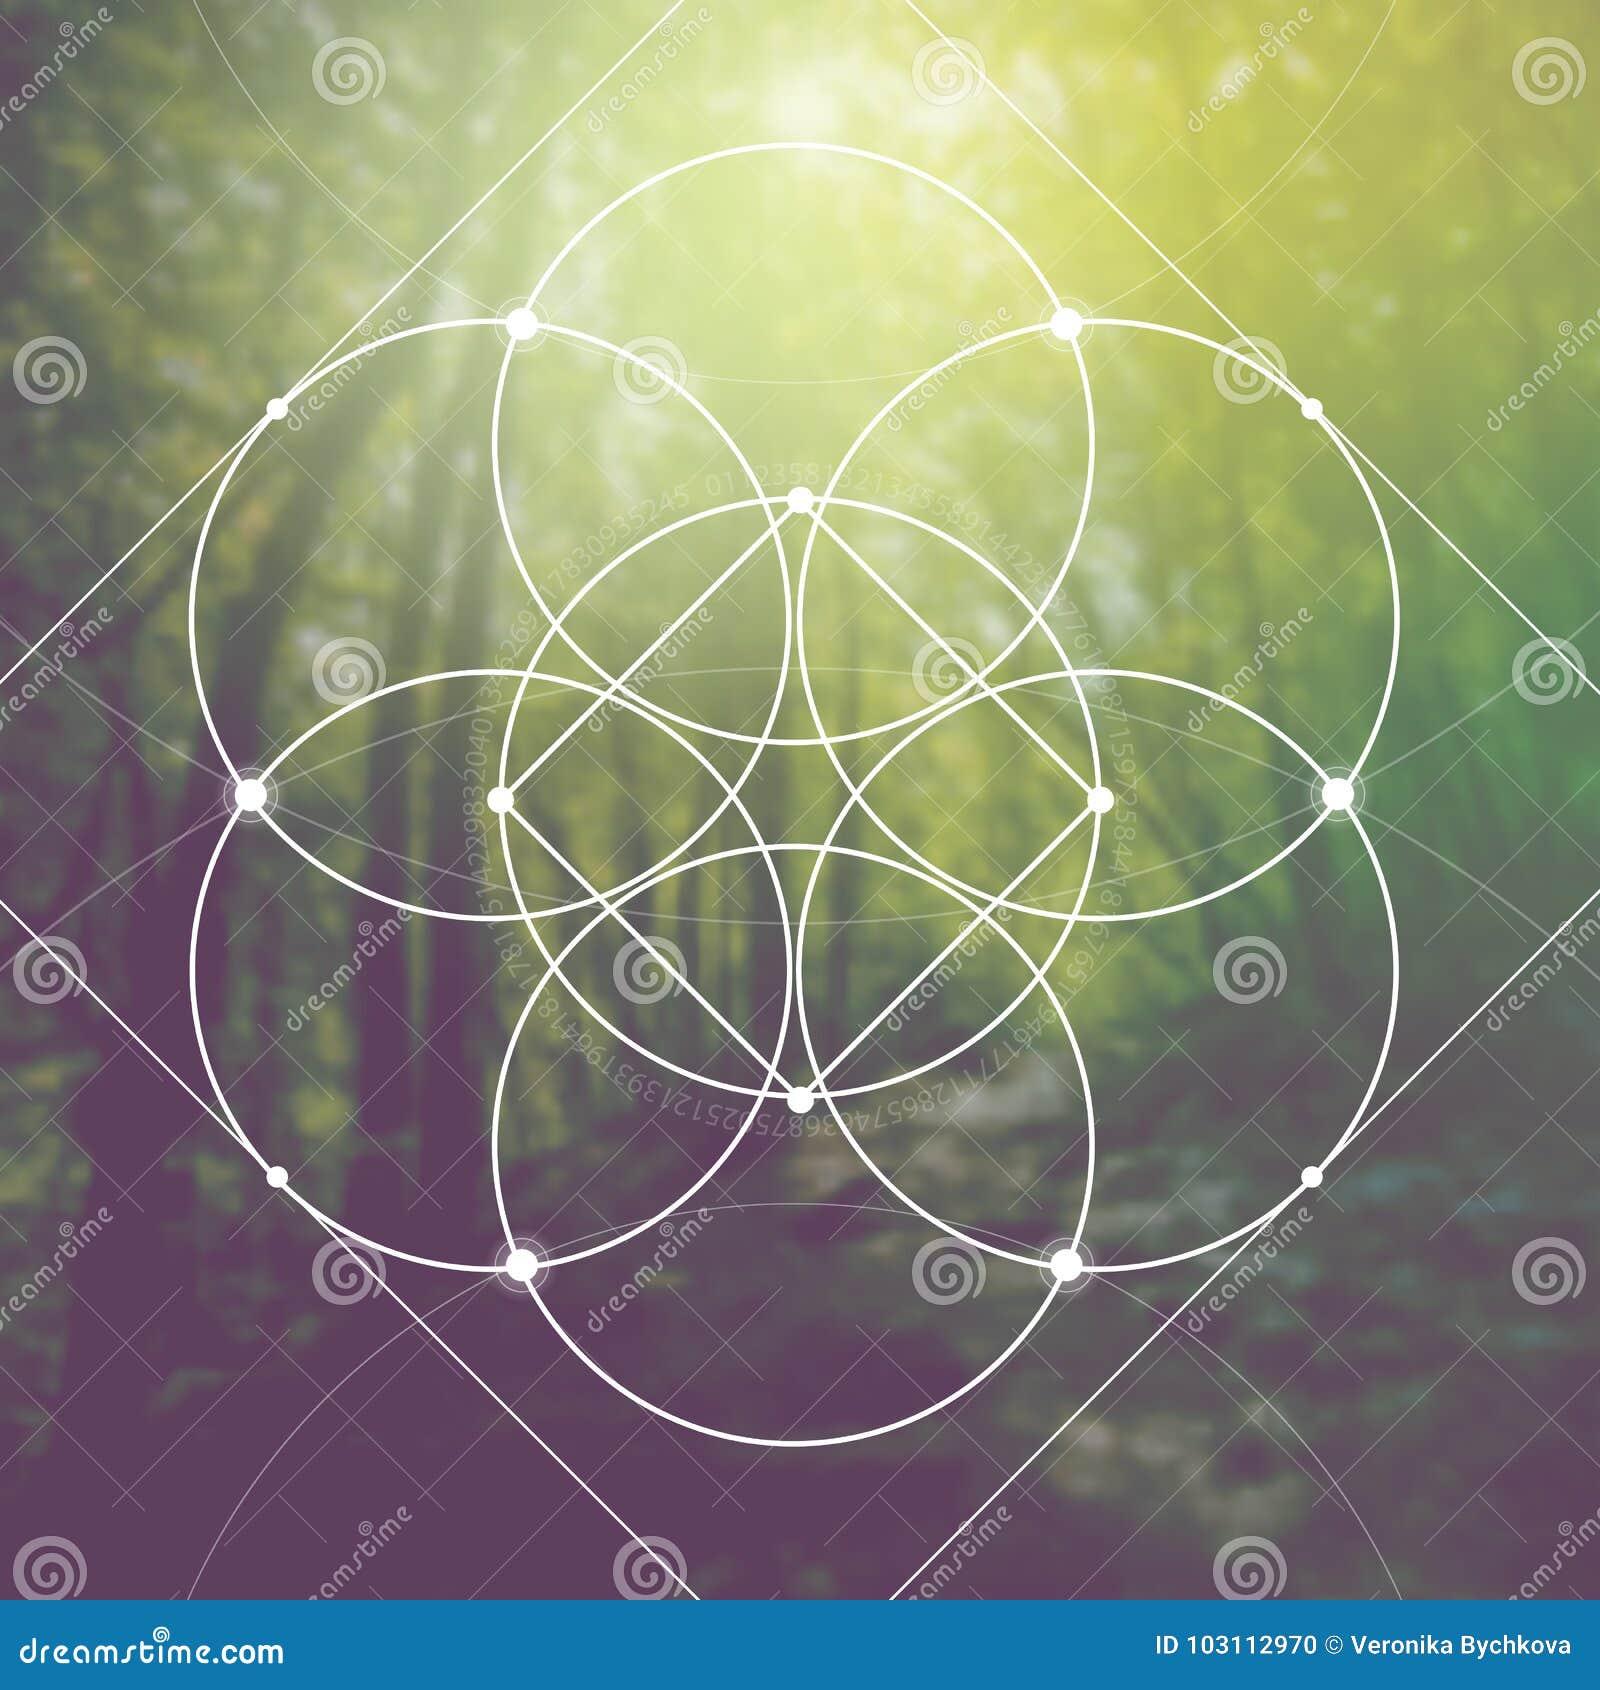 Blomma av liv - gripa in i varandra cirklar forntida symbol framme av suddig photorealistic naturbakgrund Sakral geometri - M